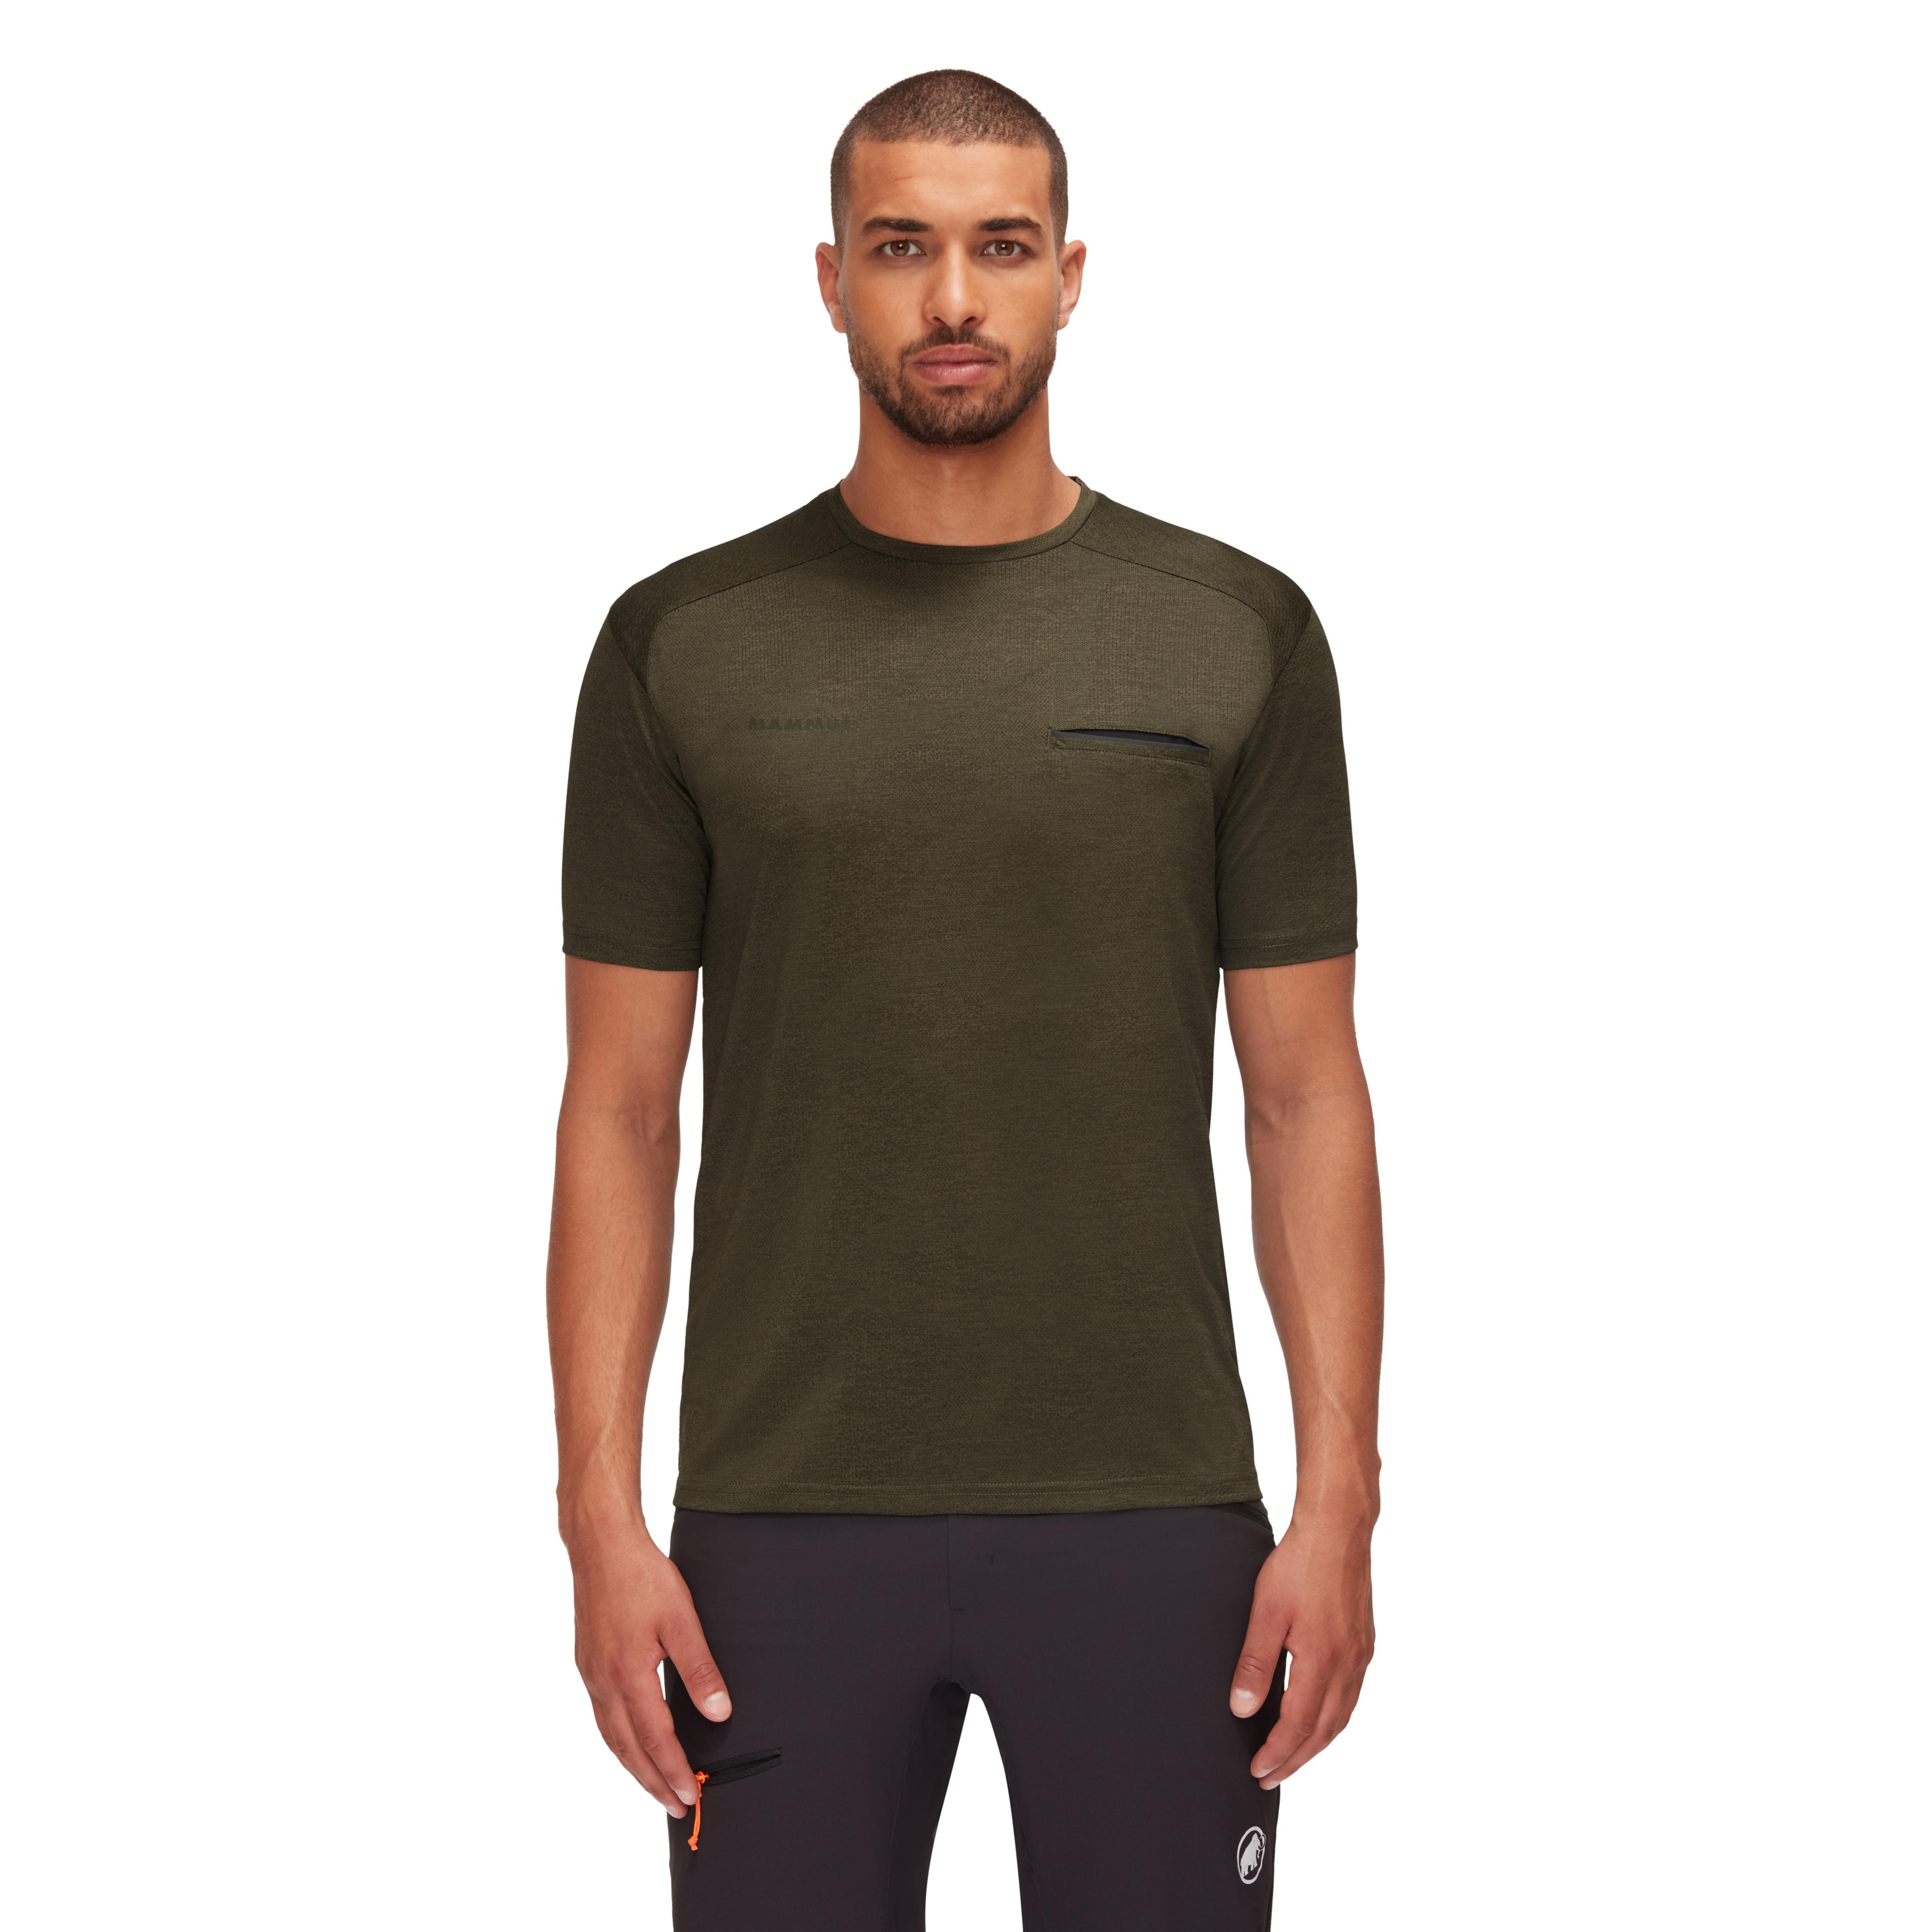 Crashiano T-Shirt Men product image